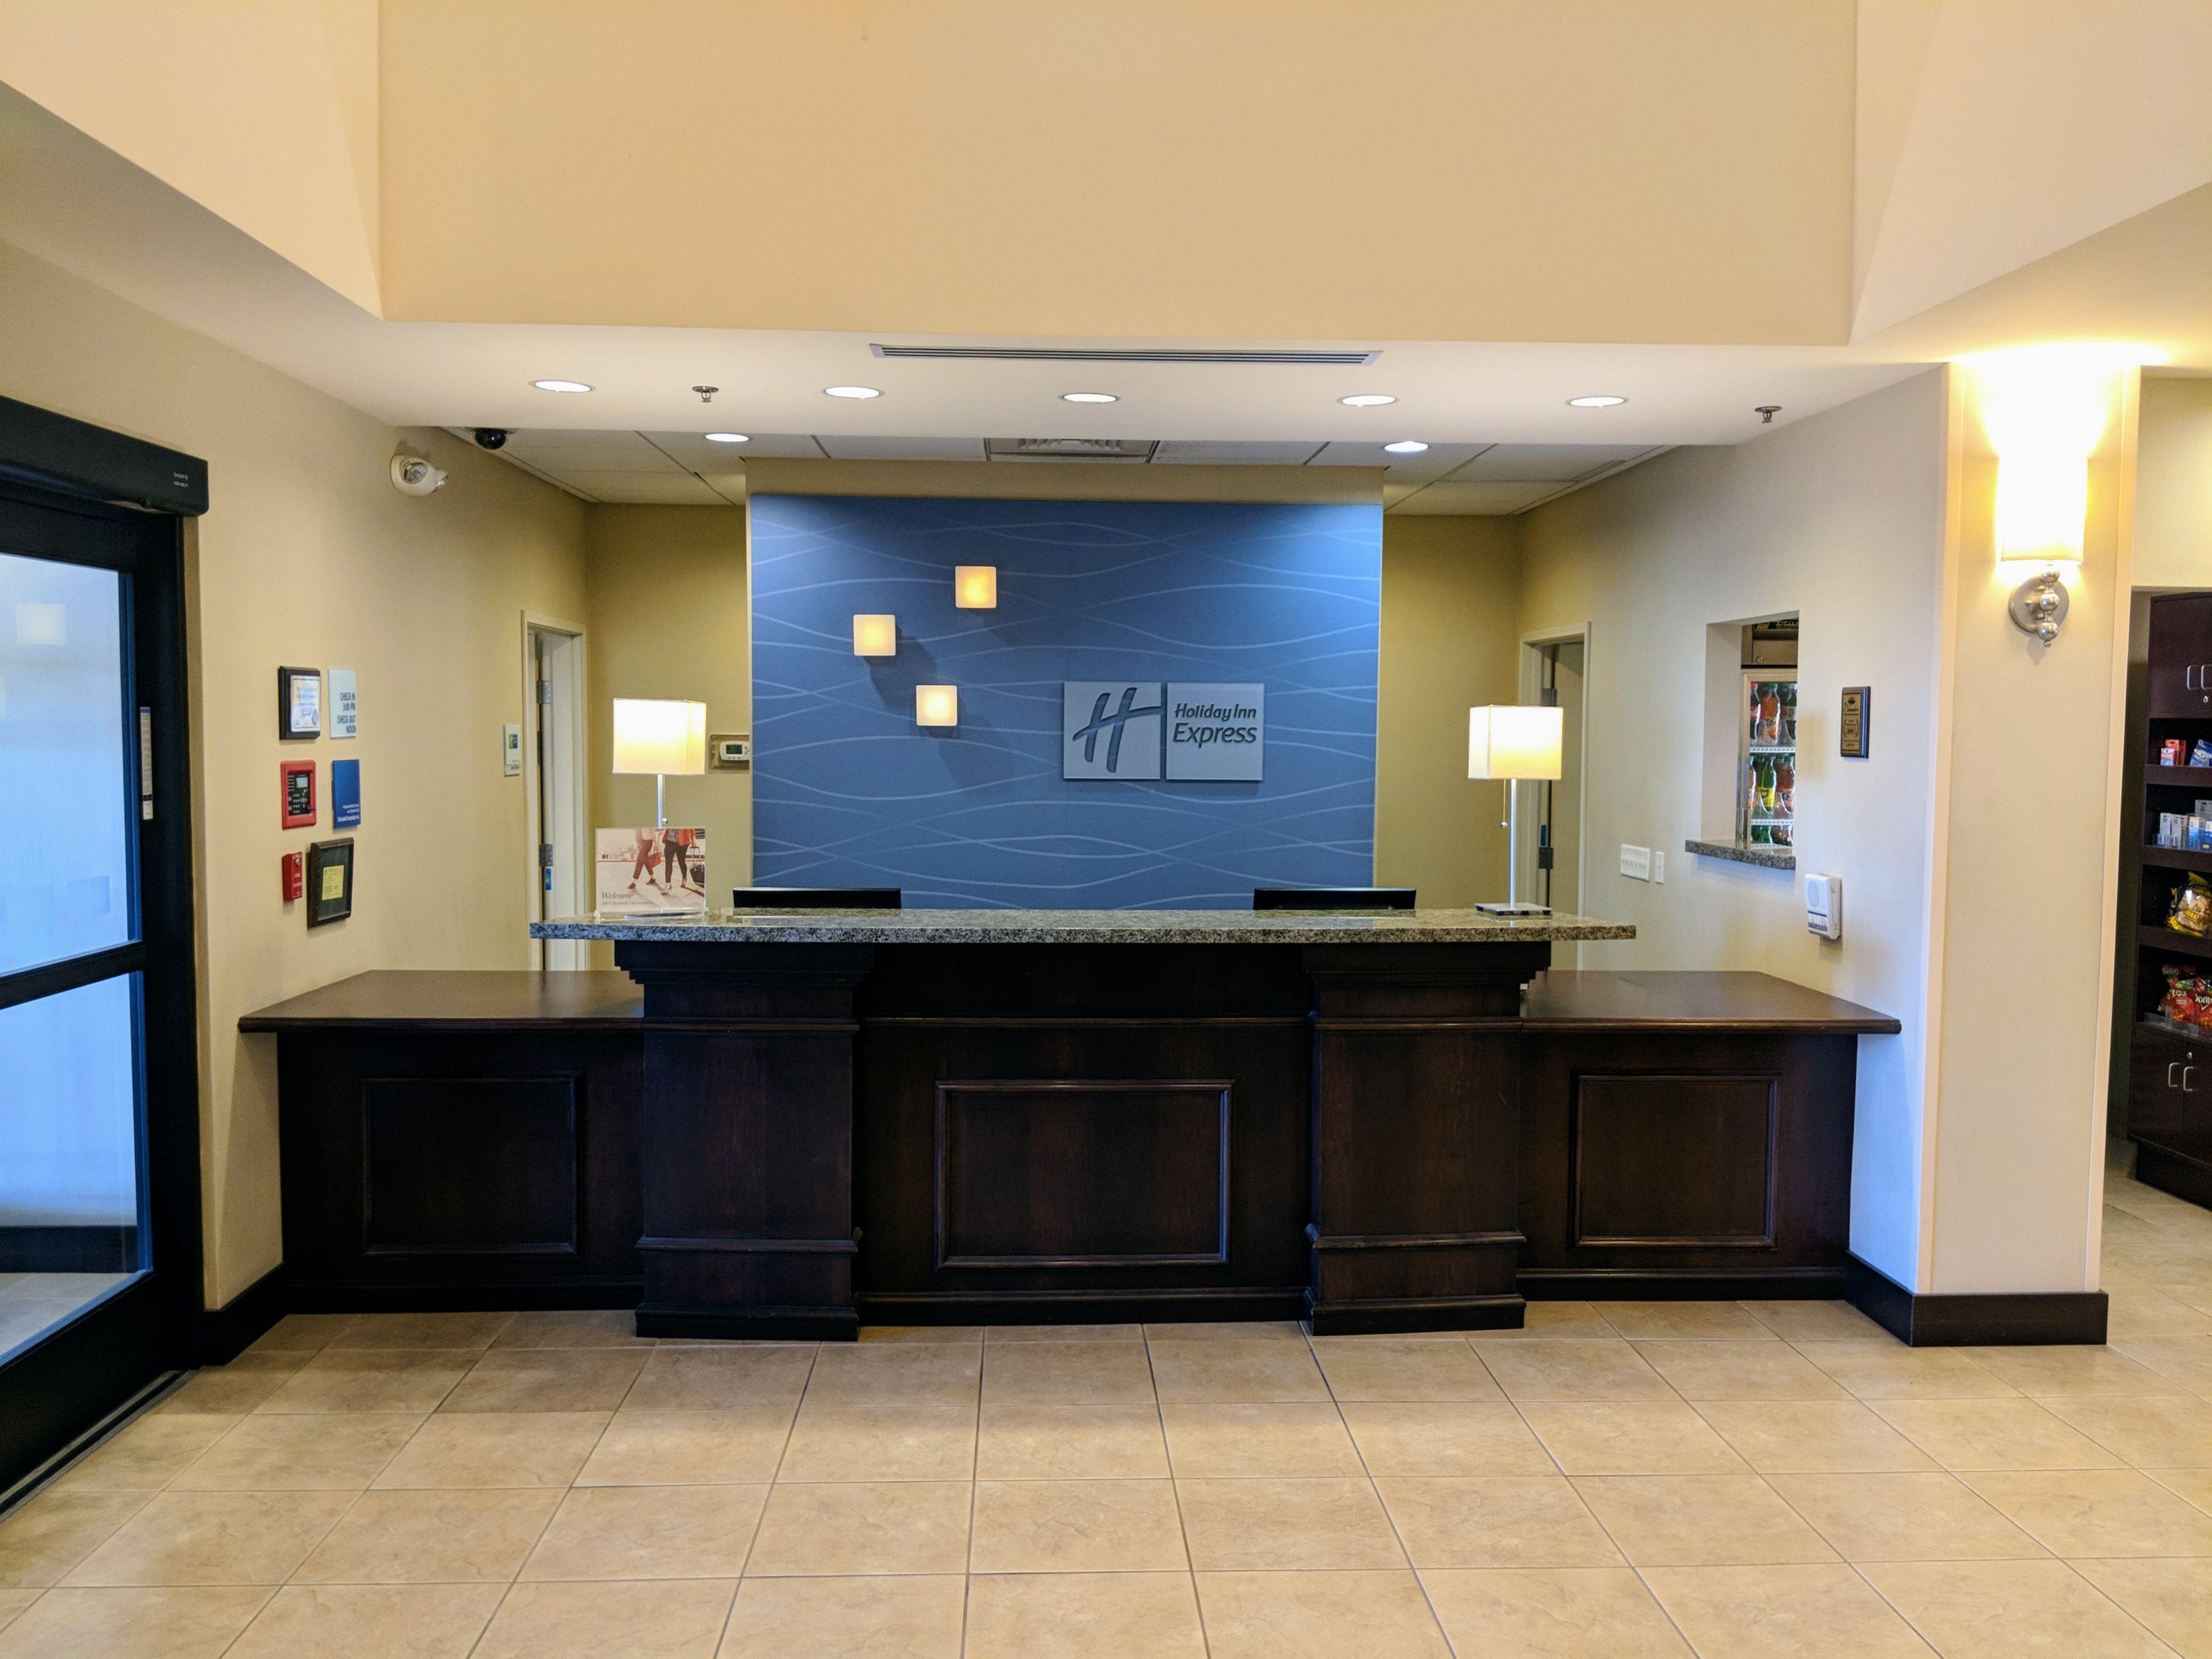 Holiday Inn Express & Suites Merced - Yosemite Natl Pk Area image 4